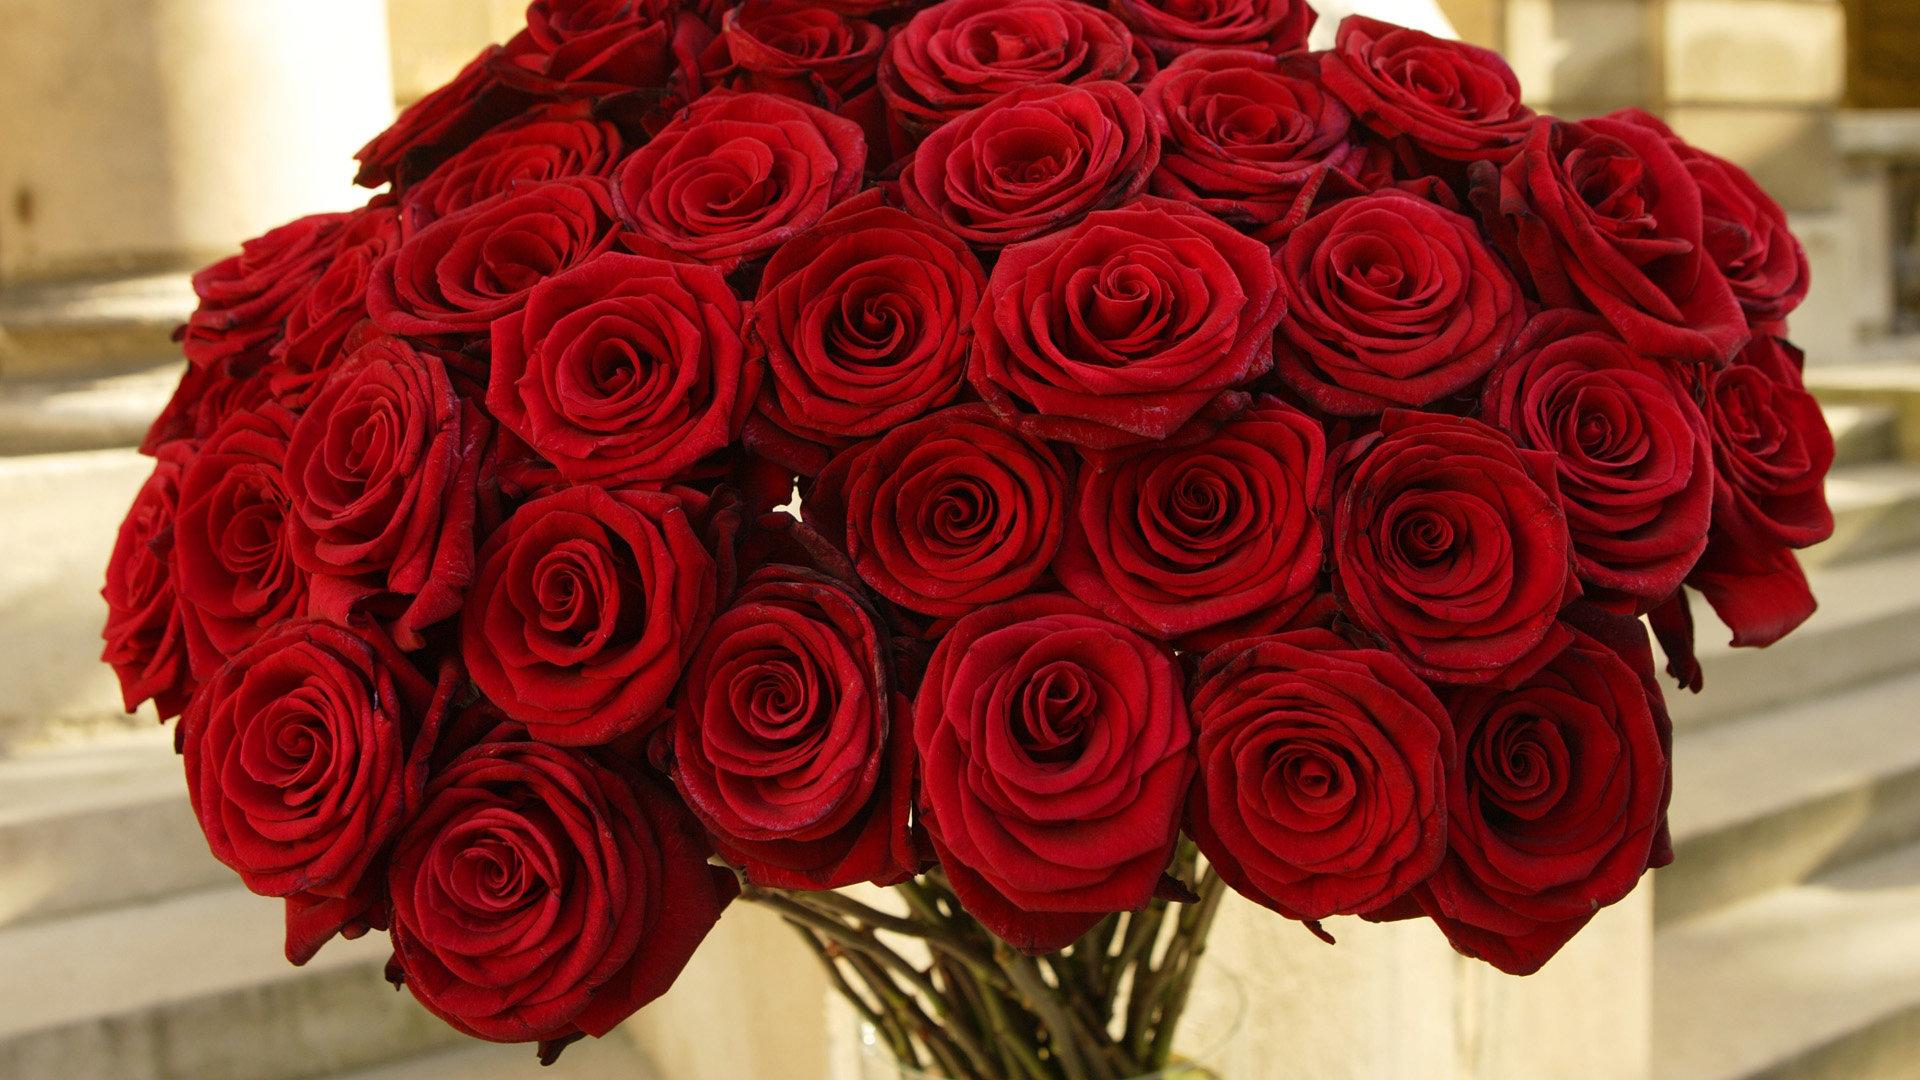 roses hd wallpapers 1080p